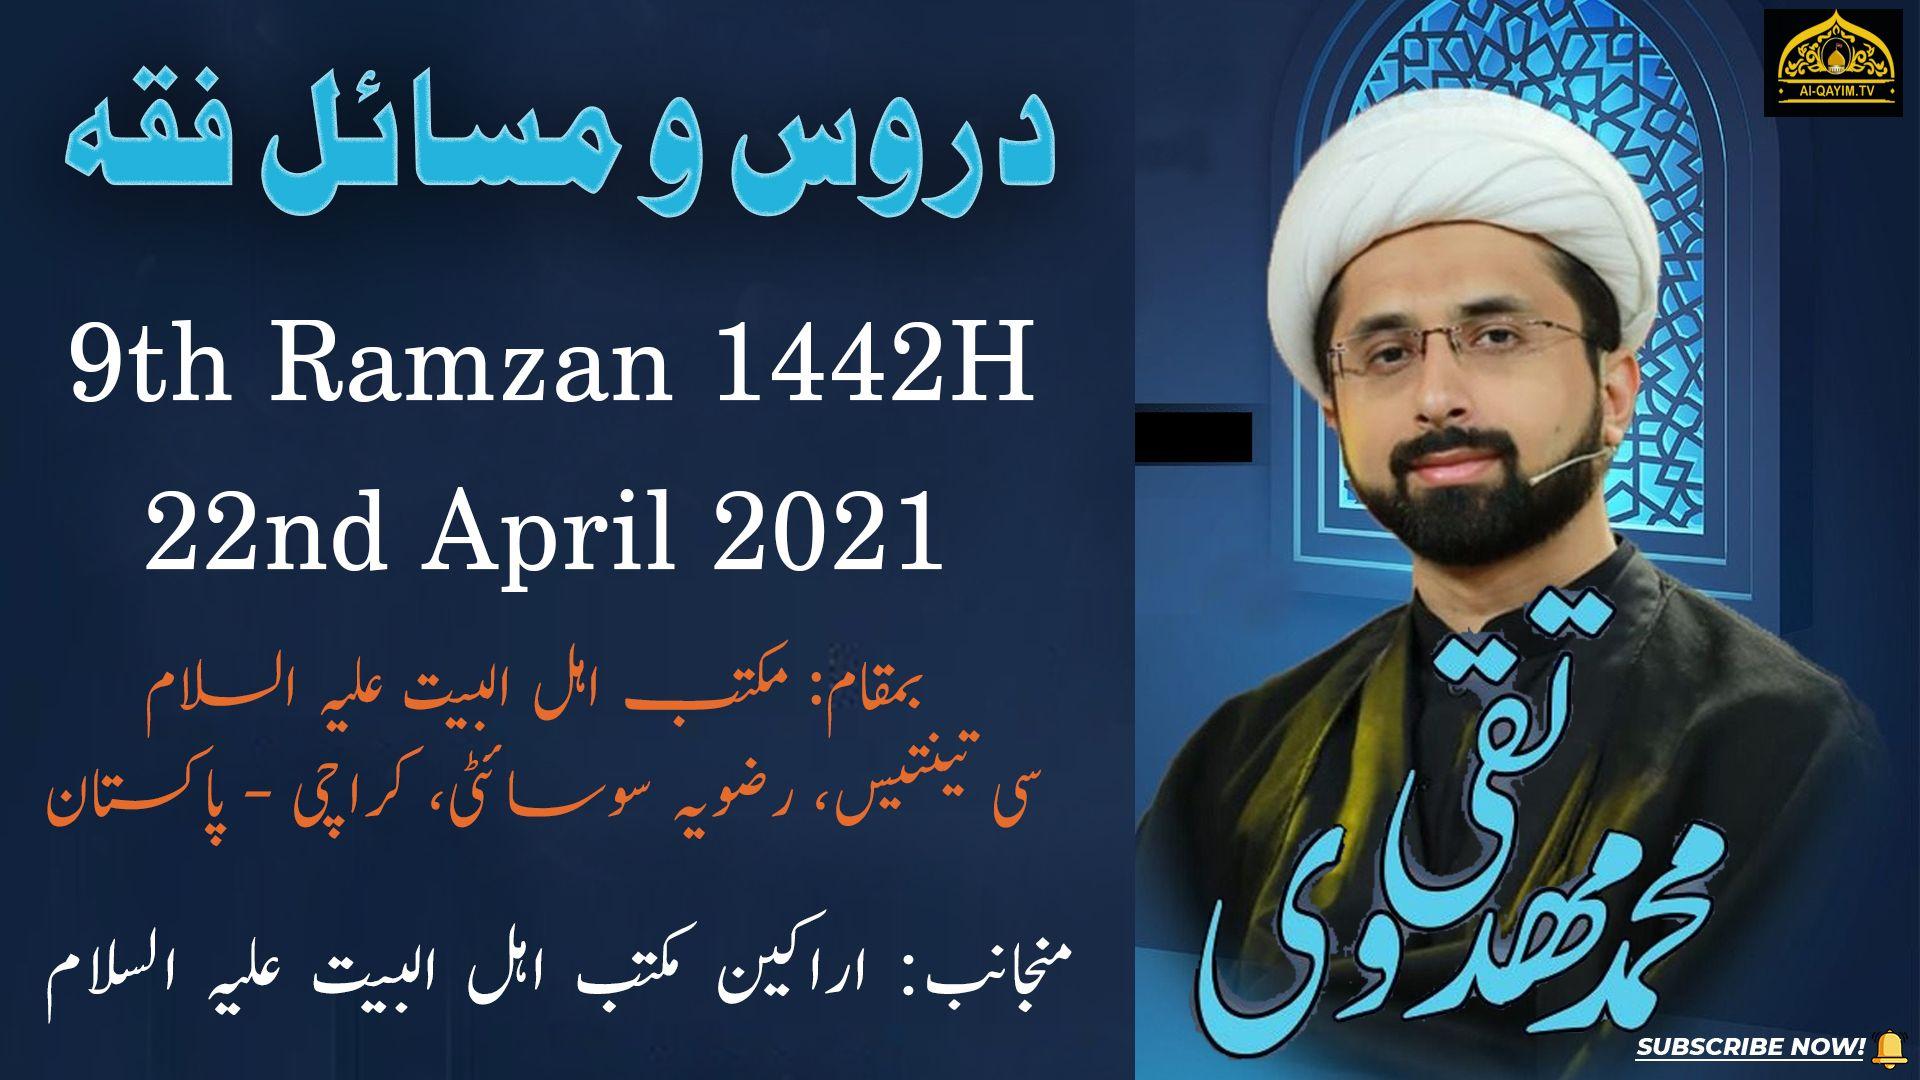 Moulana Muhammad Taqi Mehdavi | Dars Wo Masail Fiqae | 9th Ramzan 2021 | Maktab-e-Ahlebait - Karachi